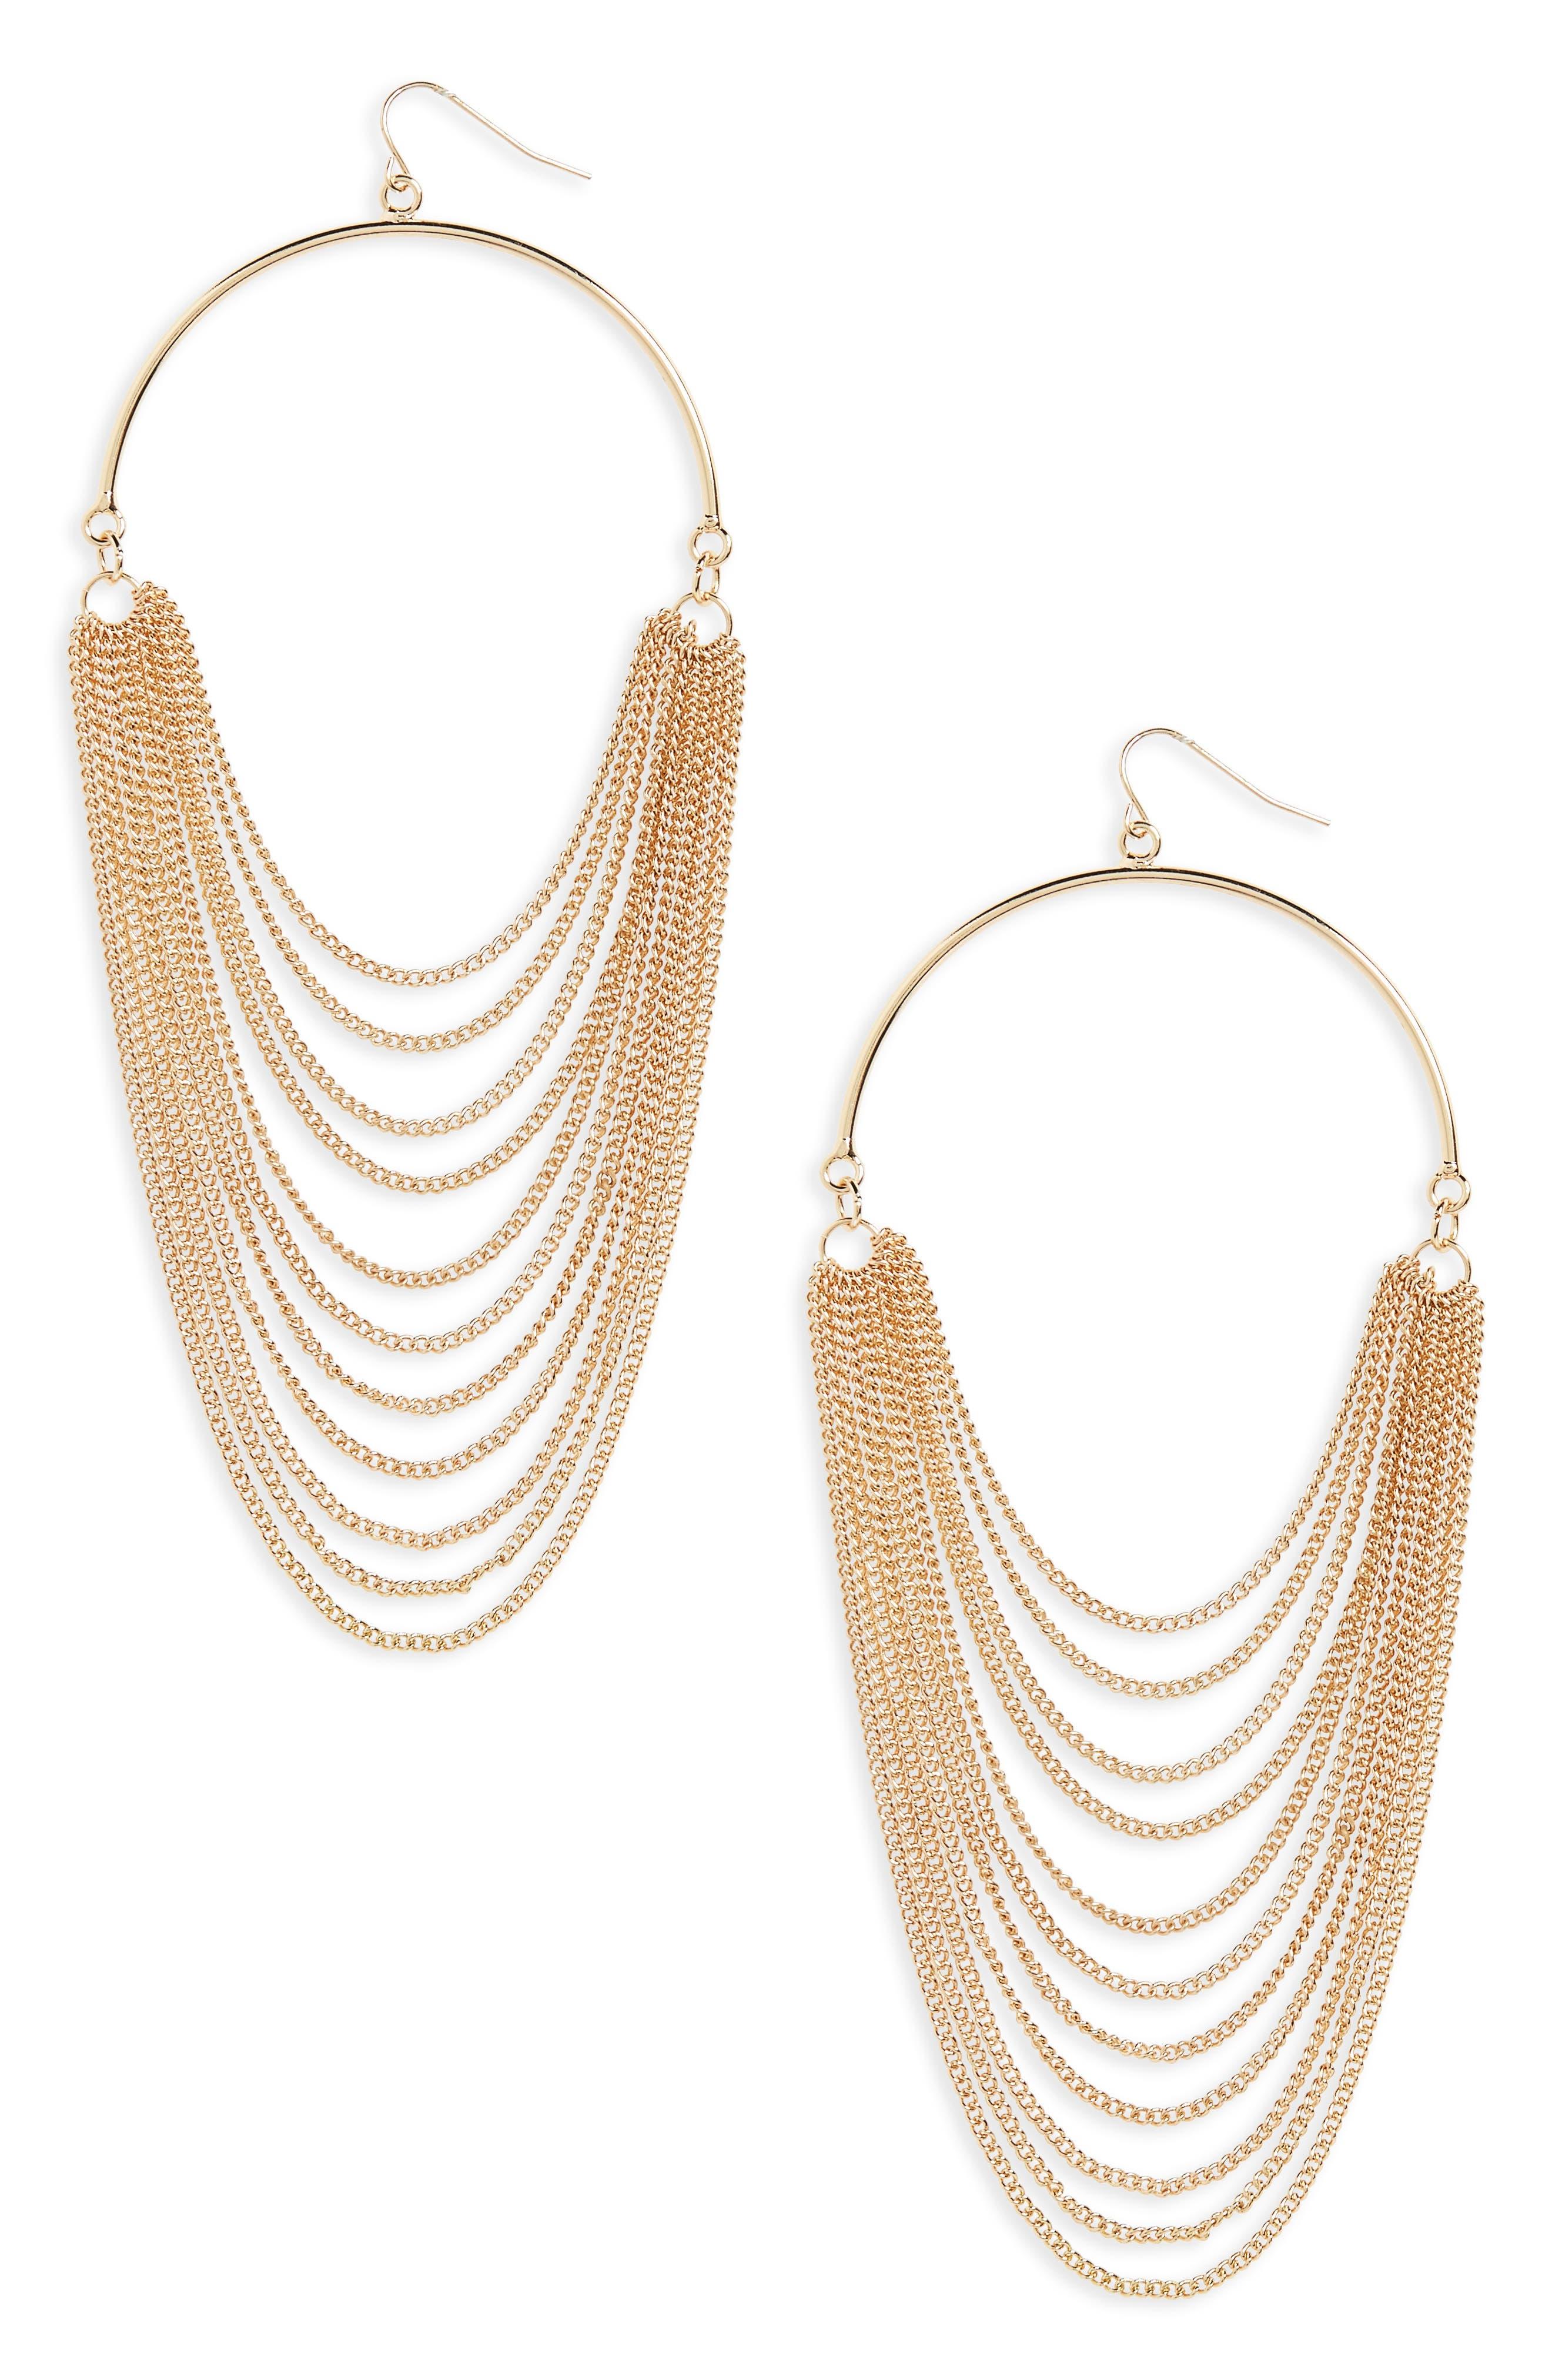 Layered Chain Hoop Earrings,                             Main thumbnail 1, color,